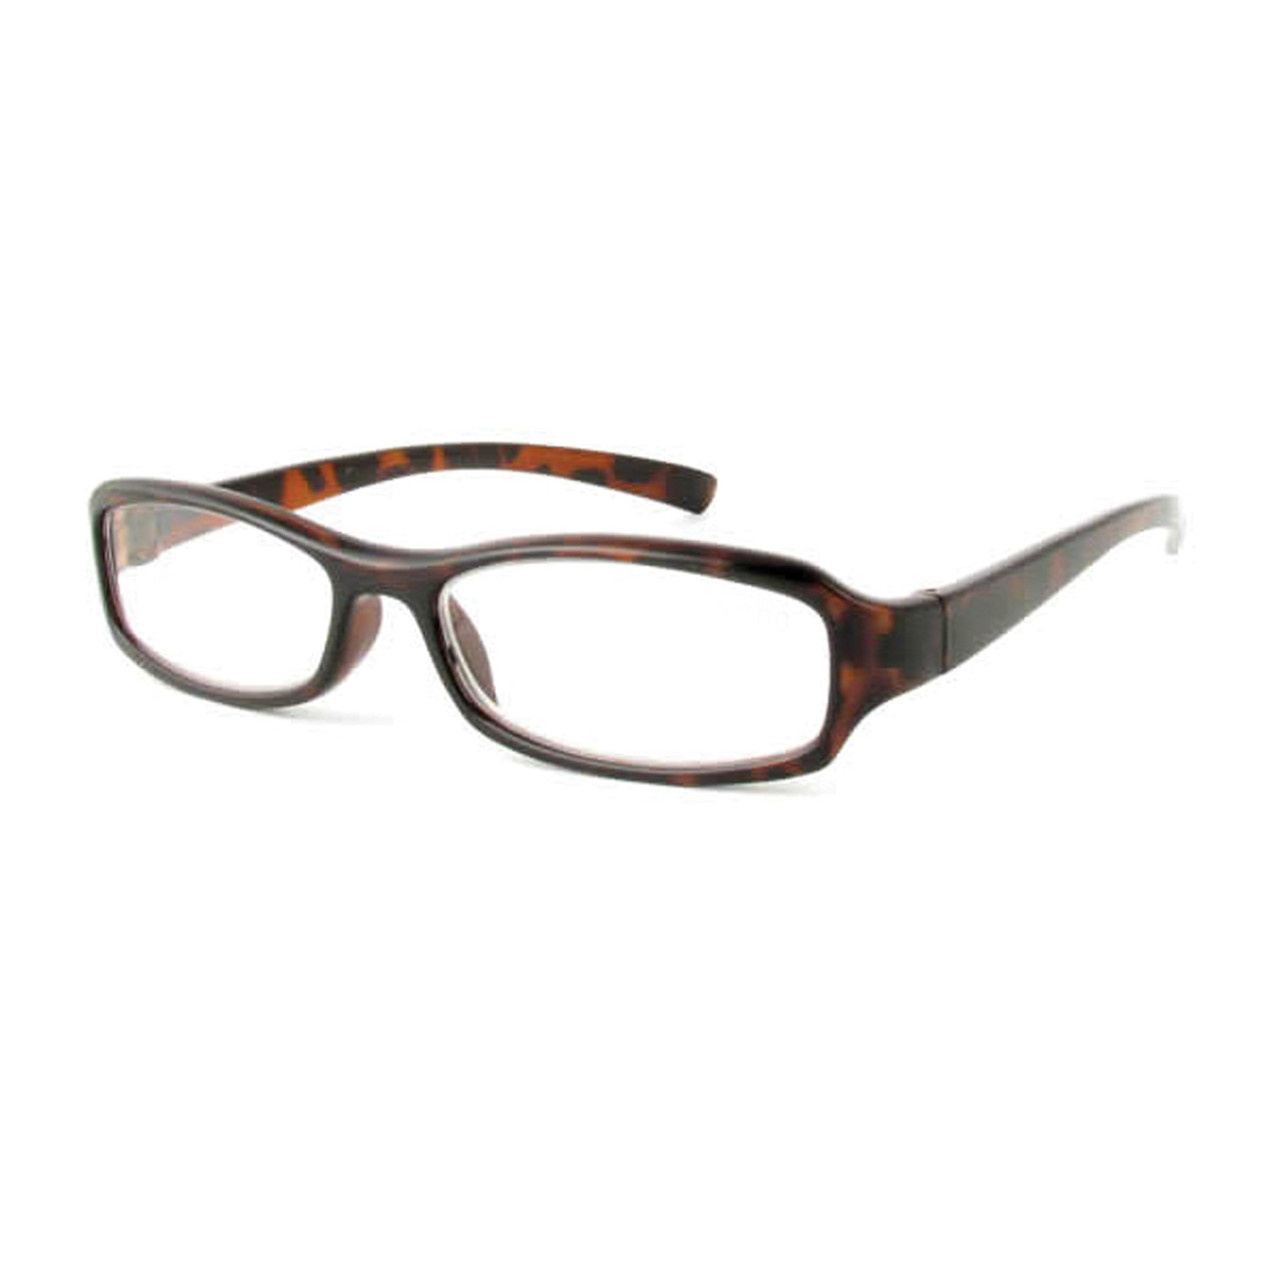 Classic Unisex Reading Glasses, Tortoise, +5